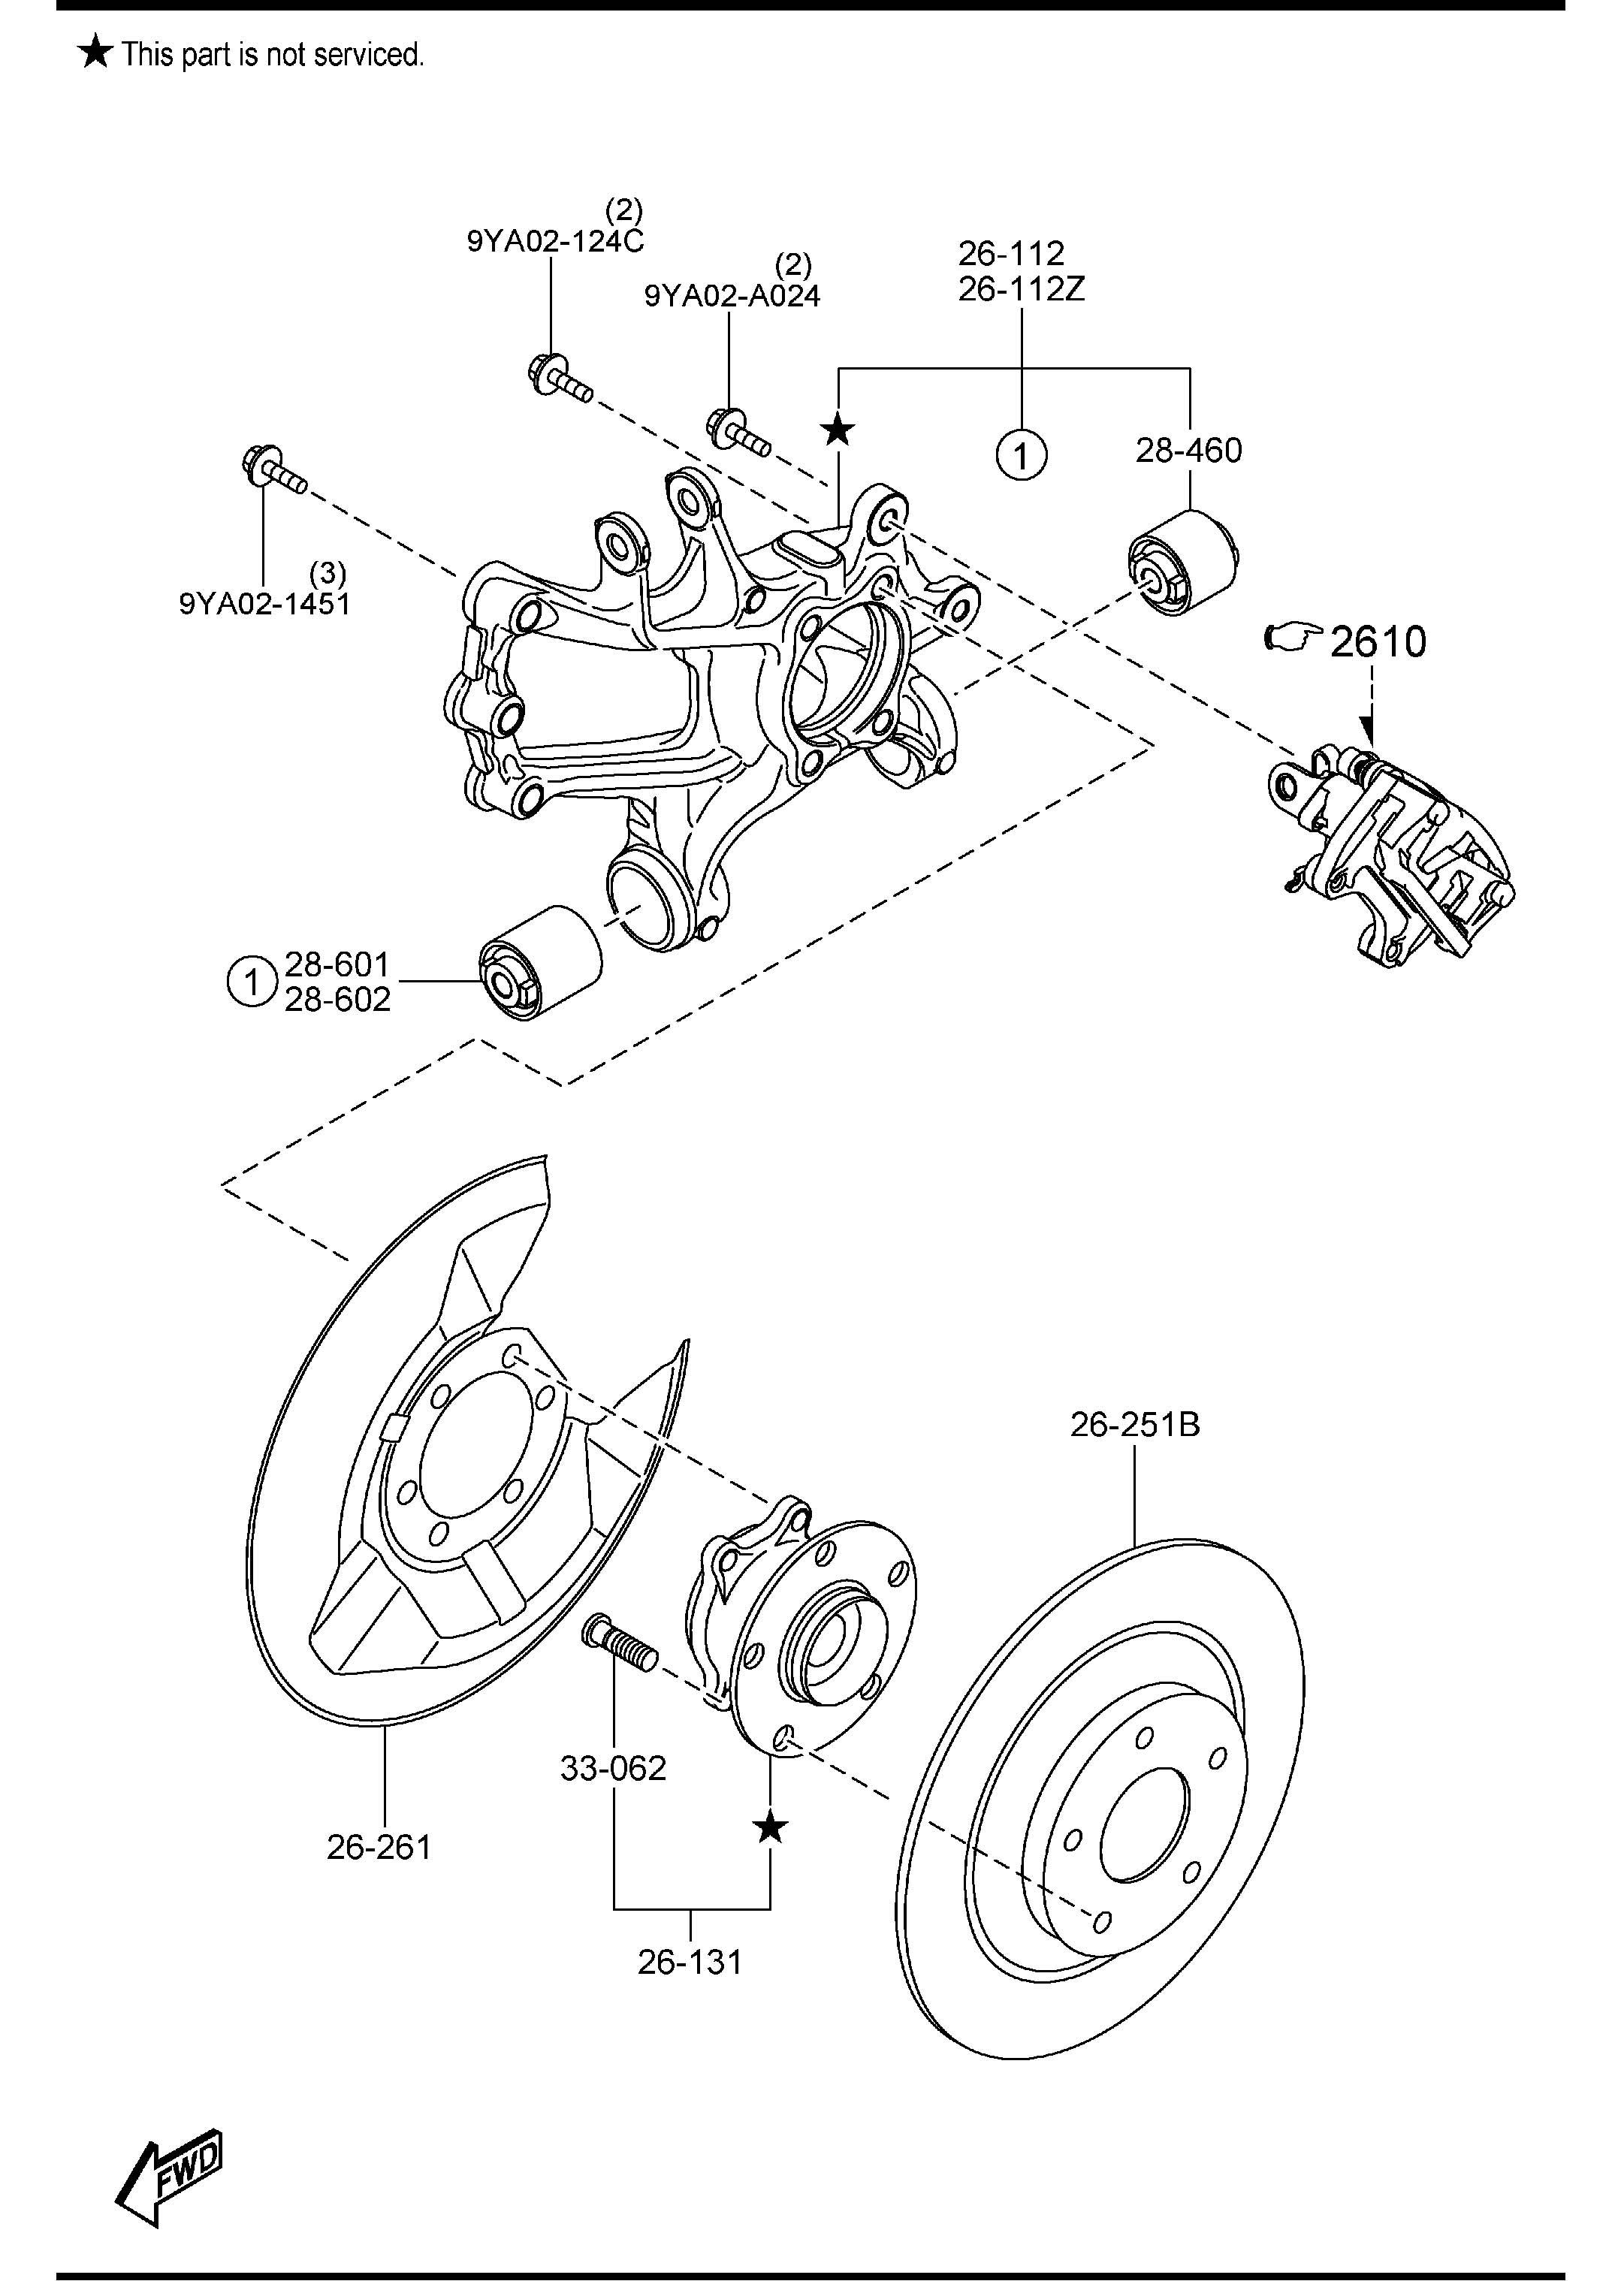 Diagram Wiring Diagram Mazda 6 Espa Ol Full Version